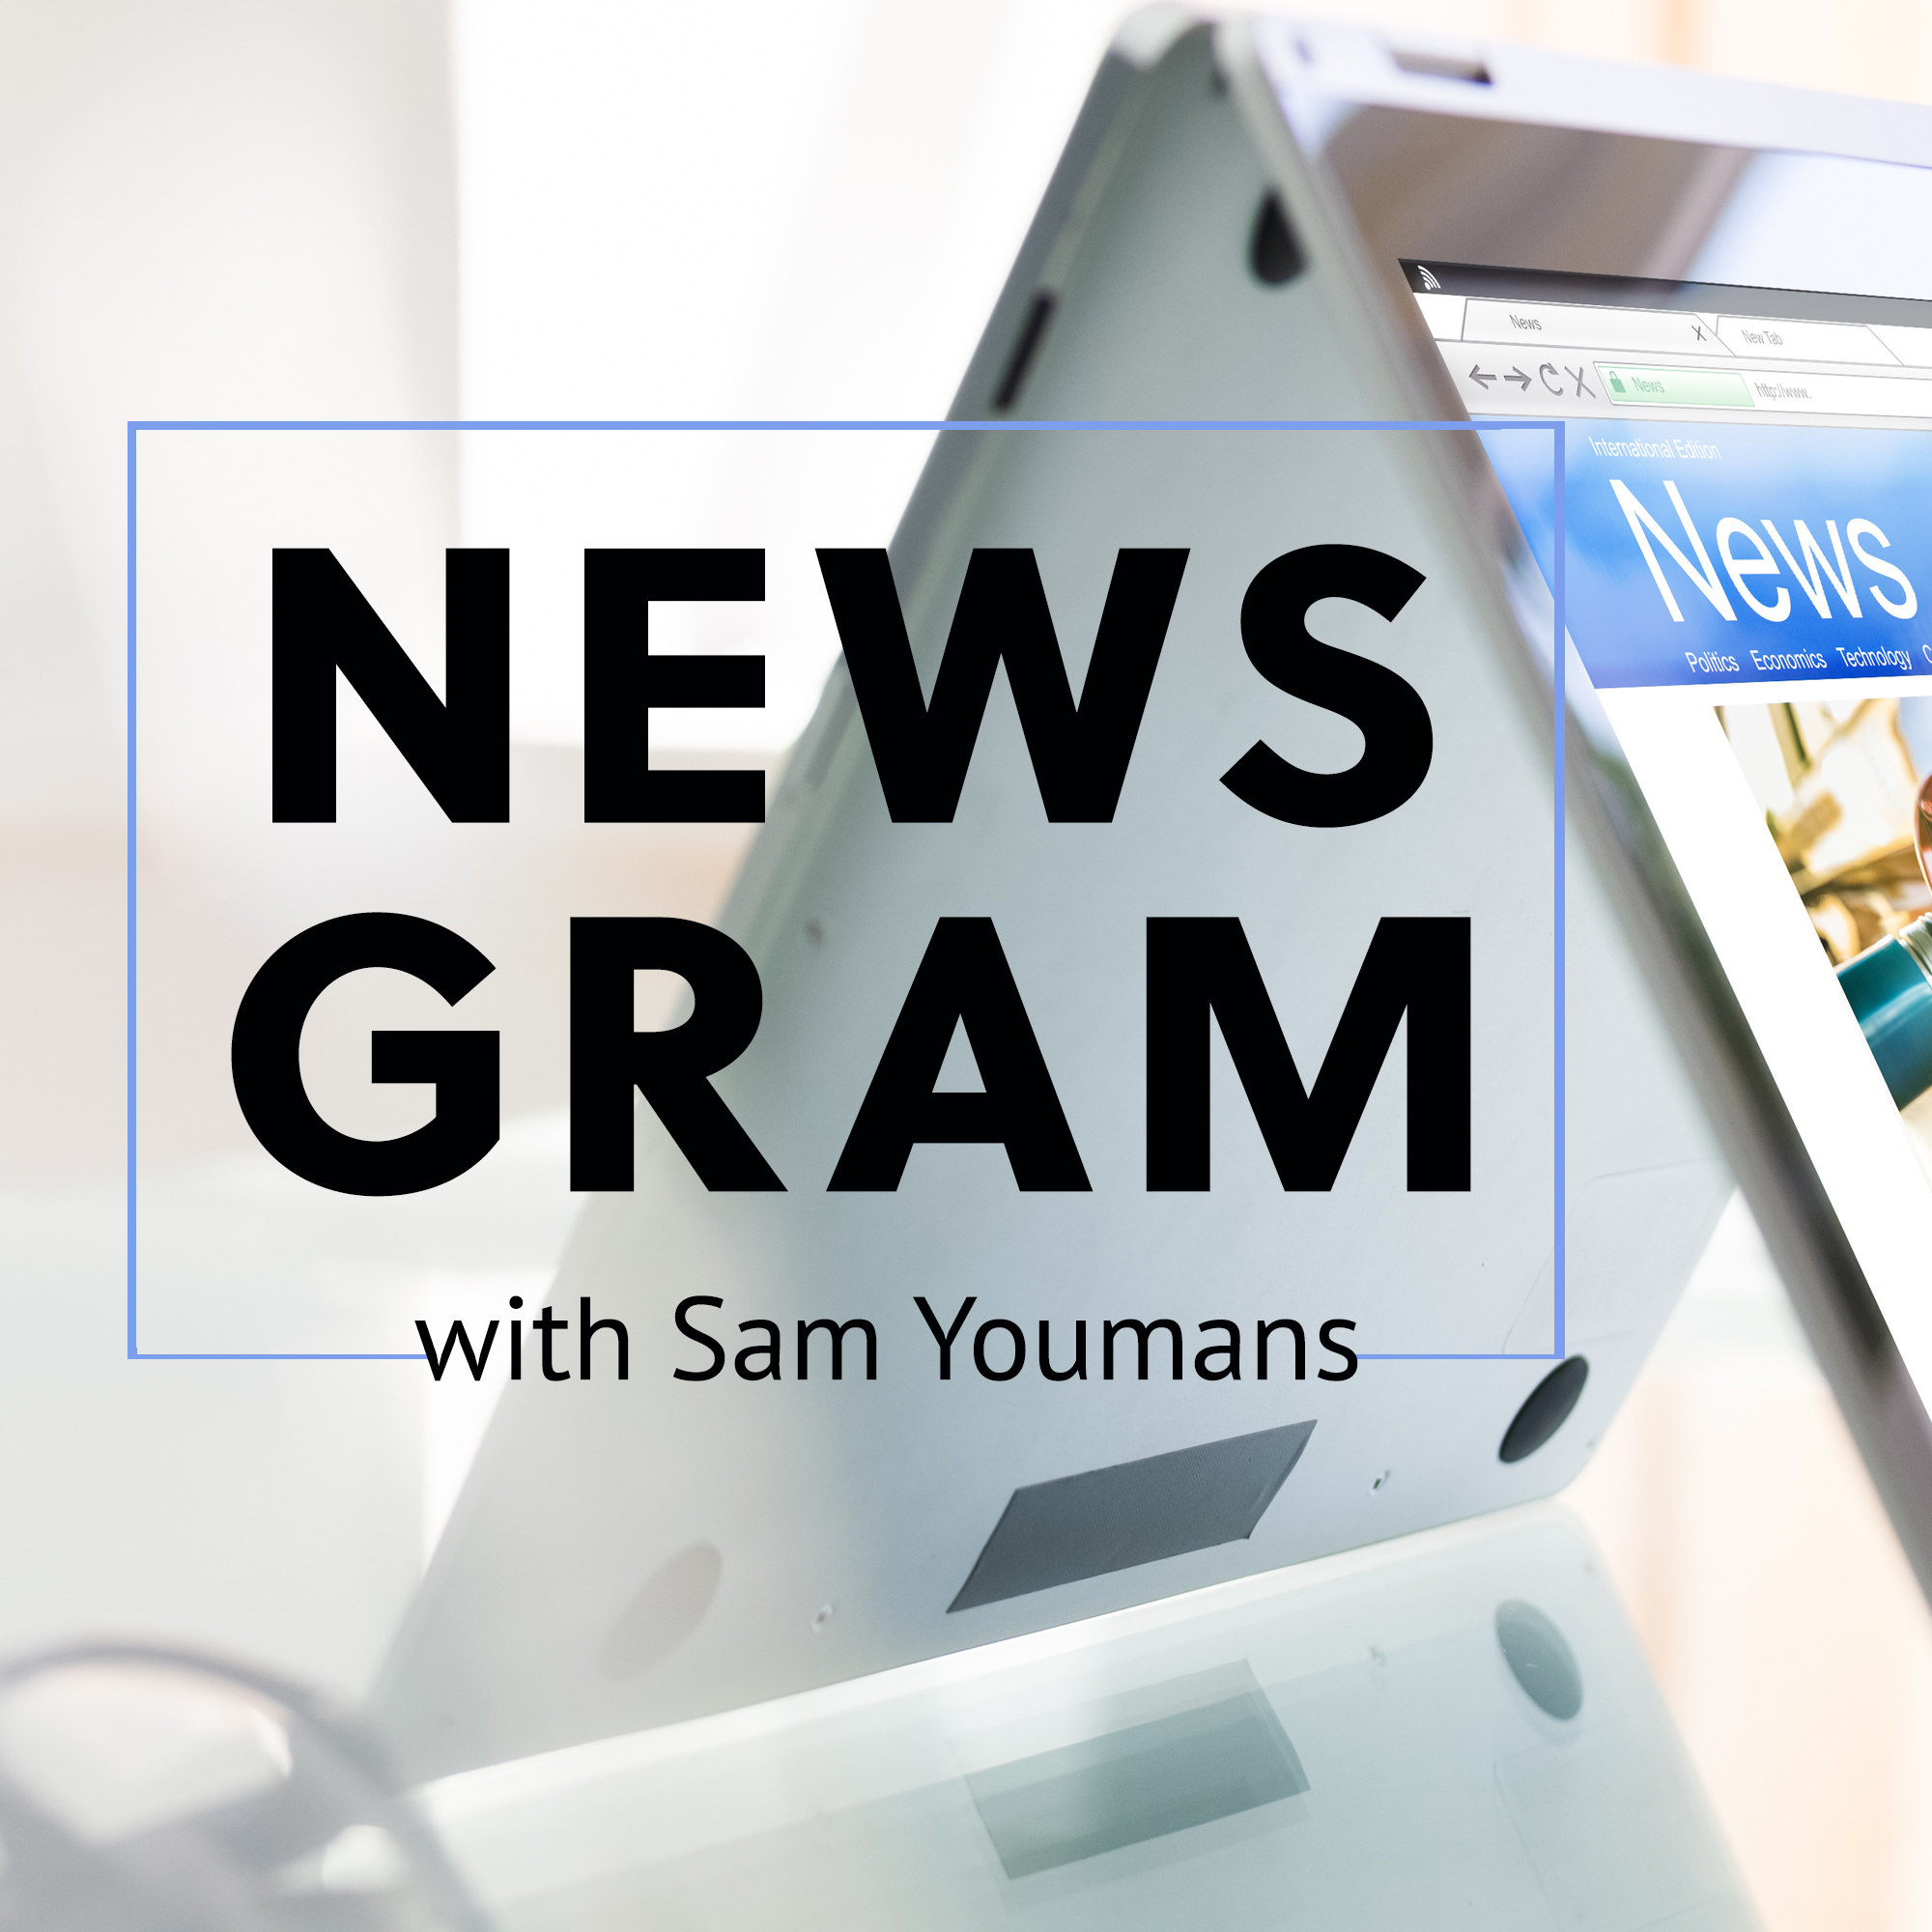 NewsGram with Sam Youmans